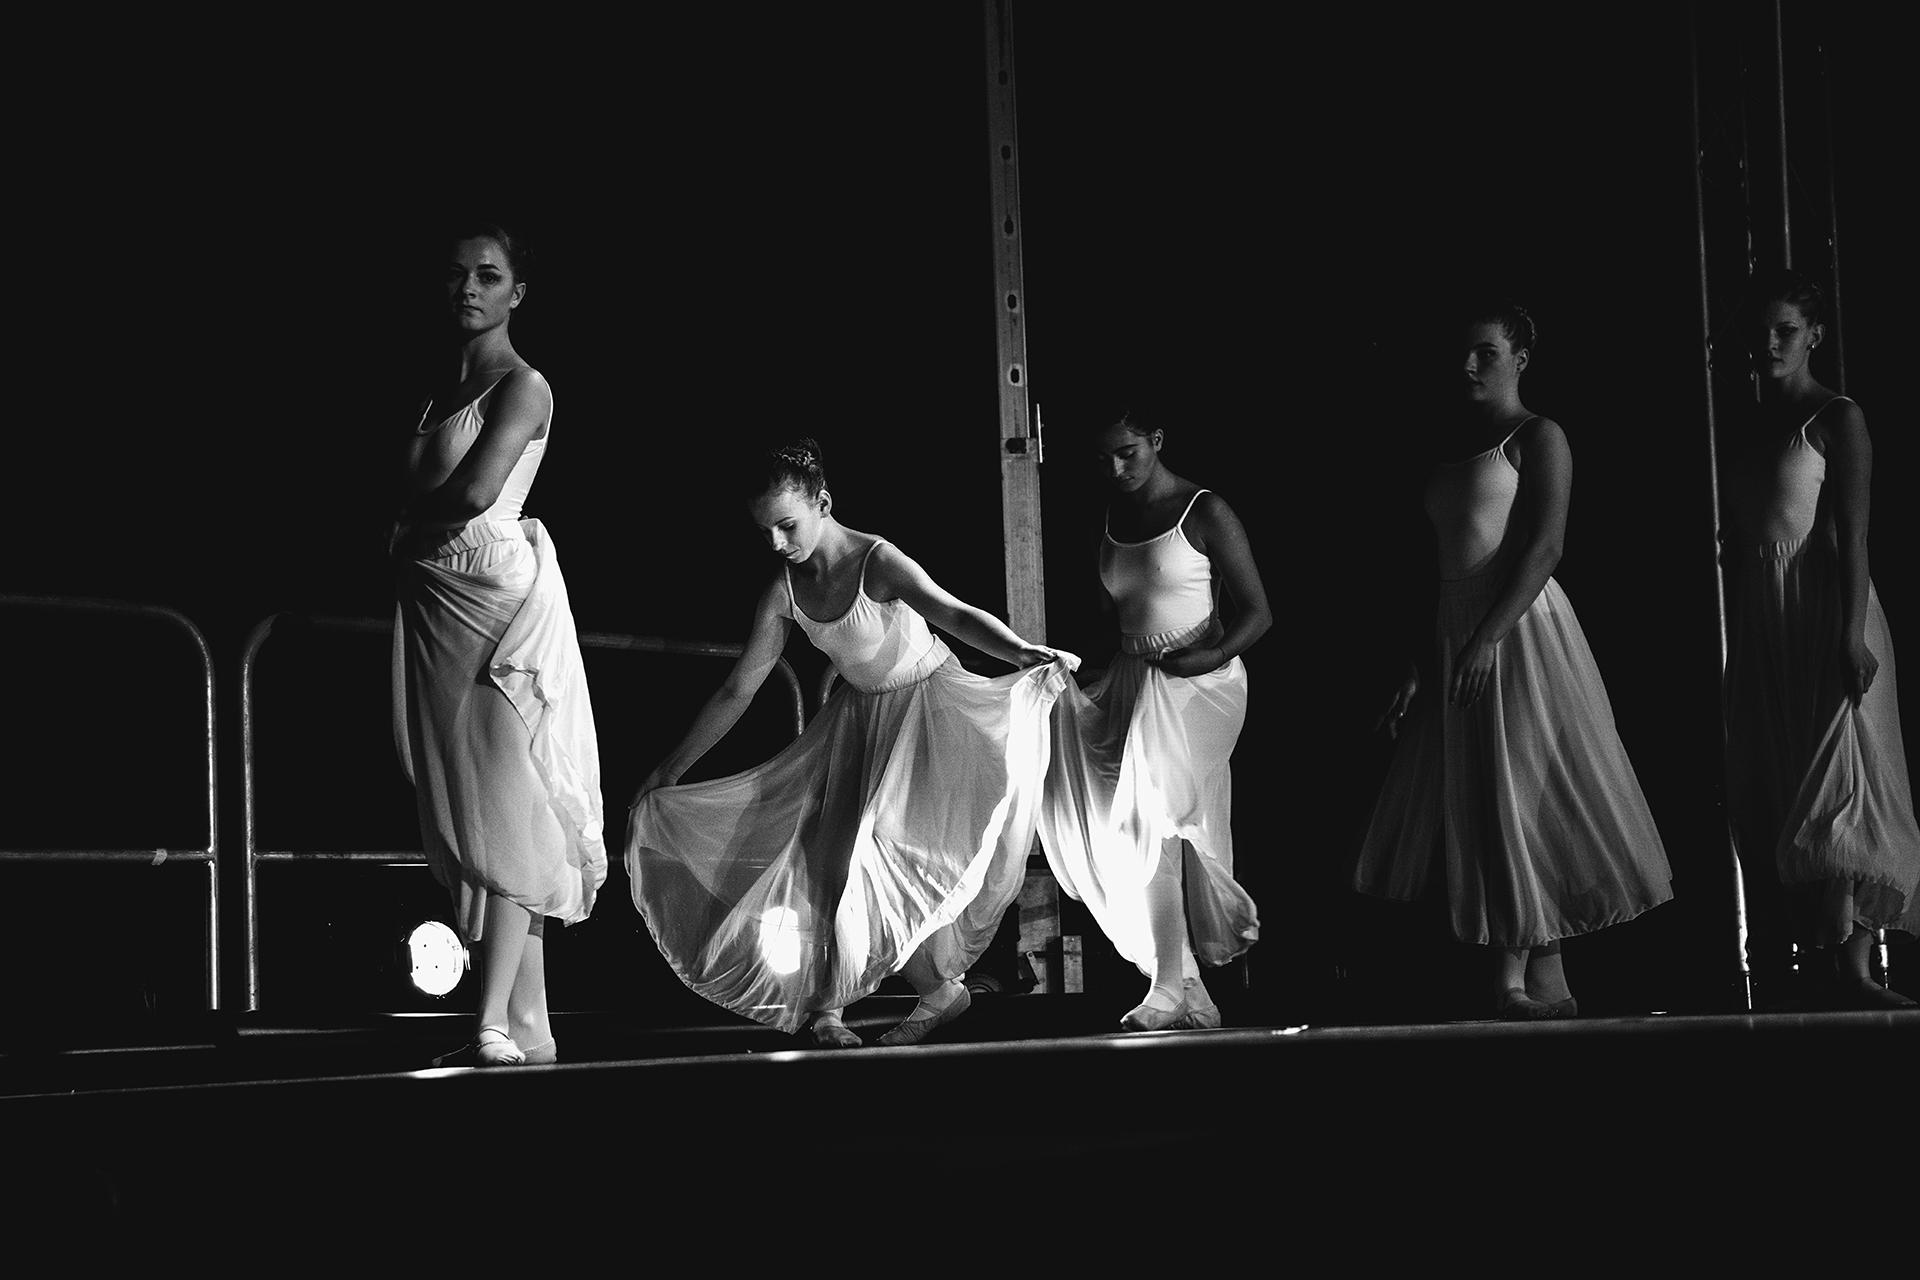 Ballett-by-SilvanGiger-4.jpg